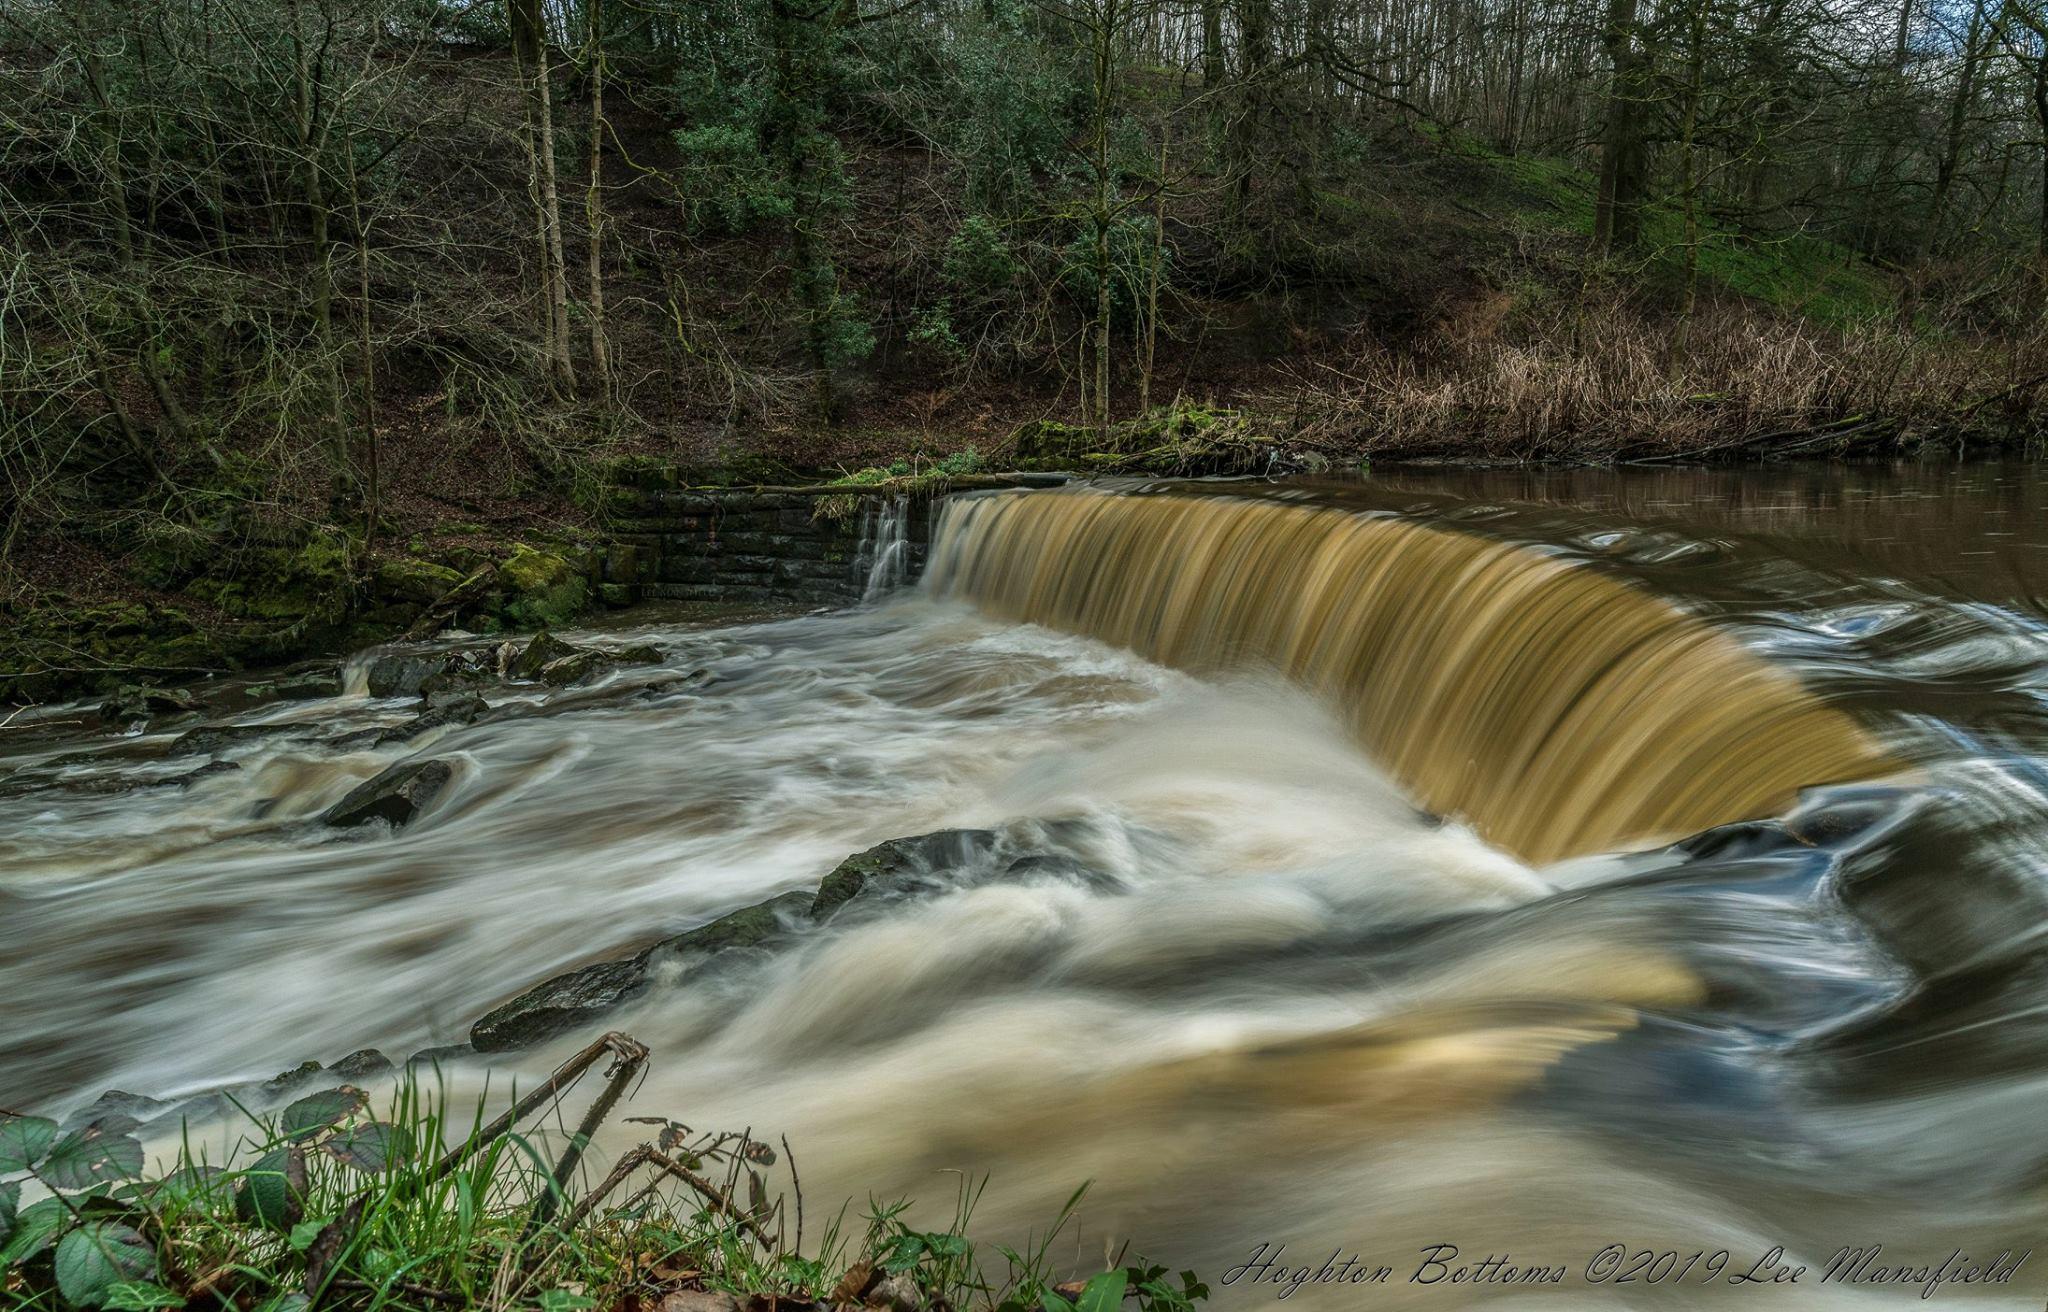 Hoghton Bottoms Weir, Chorley